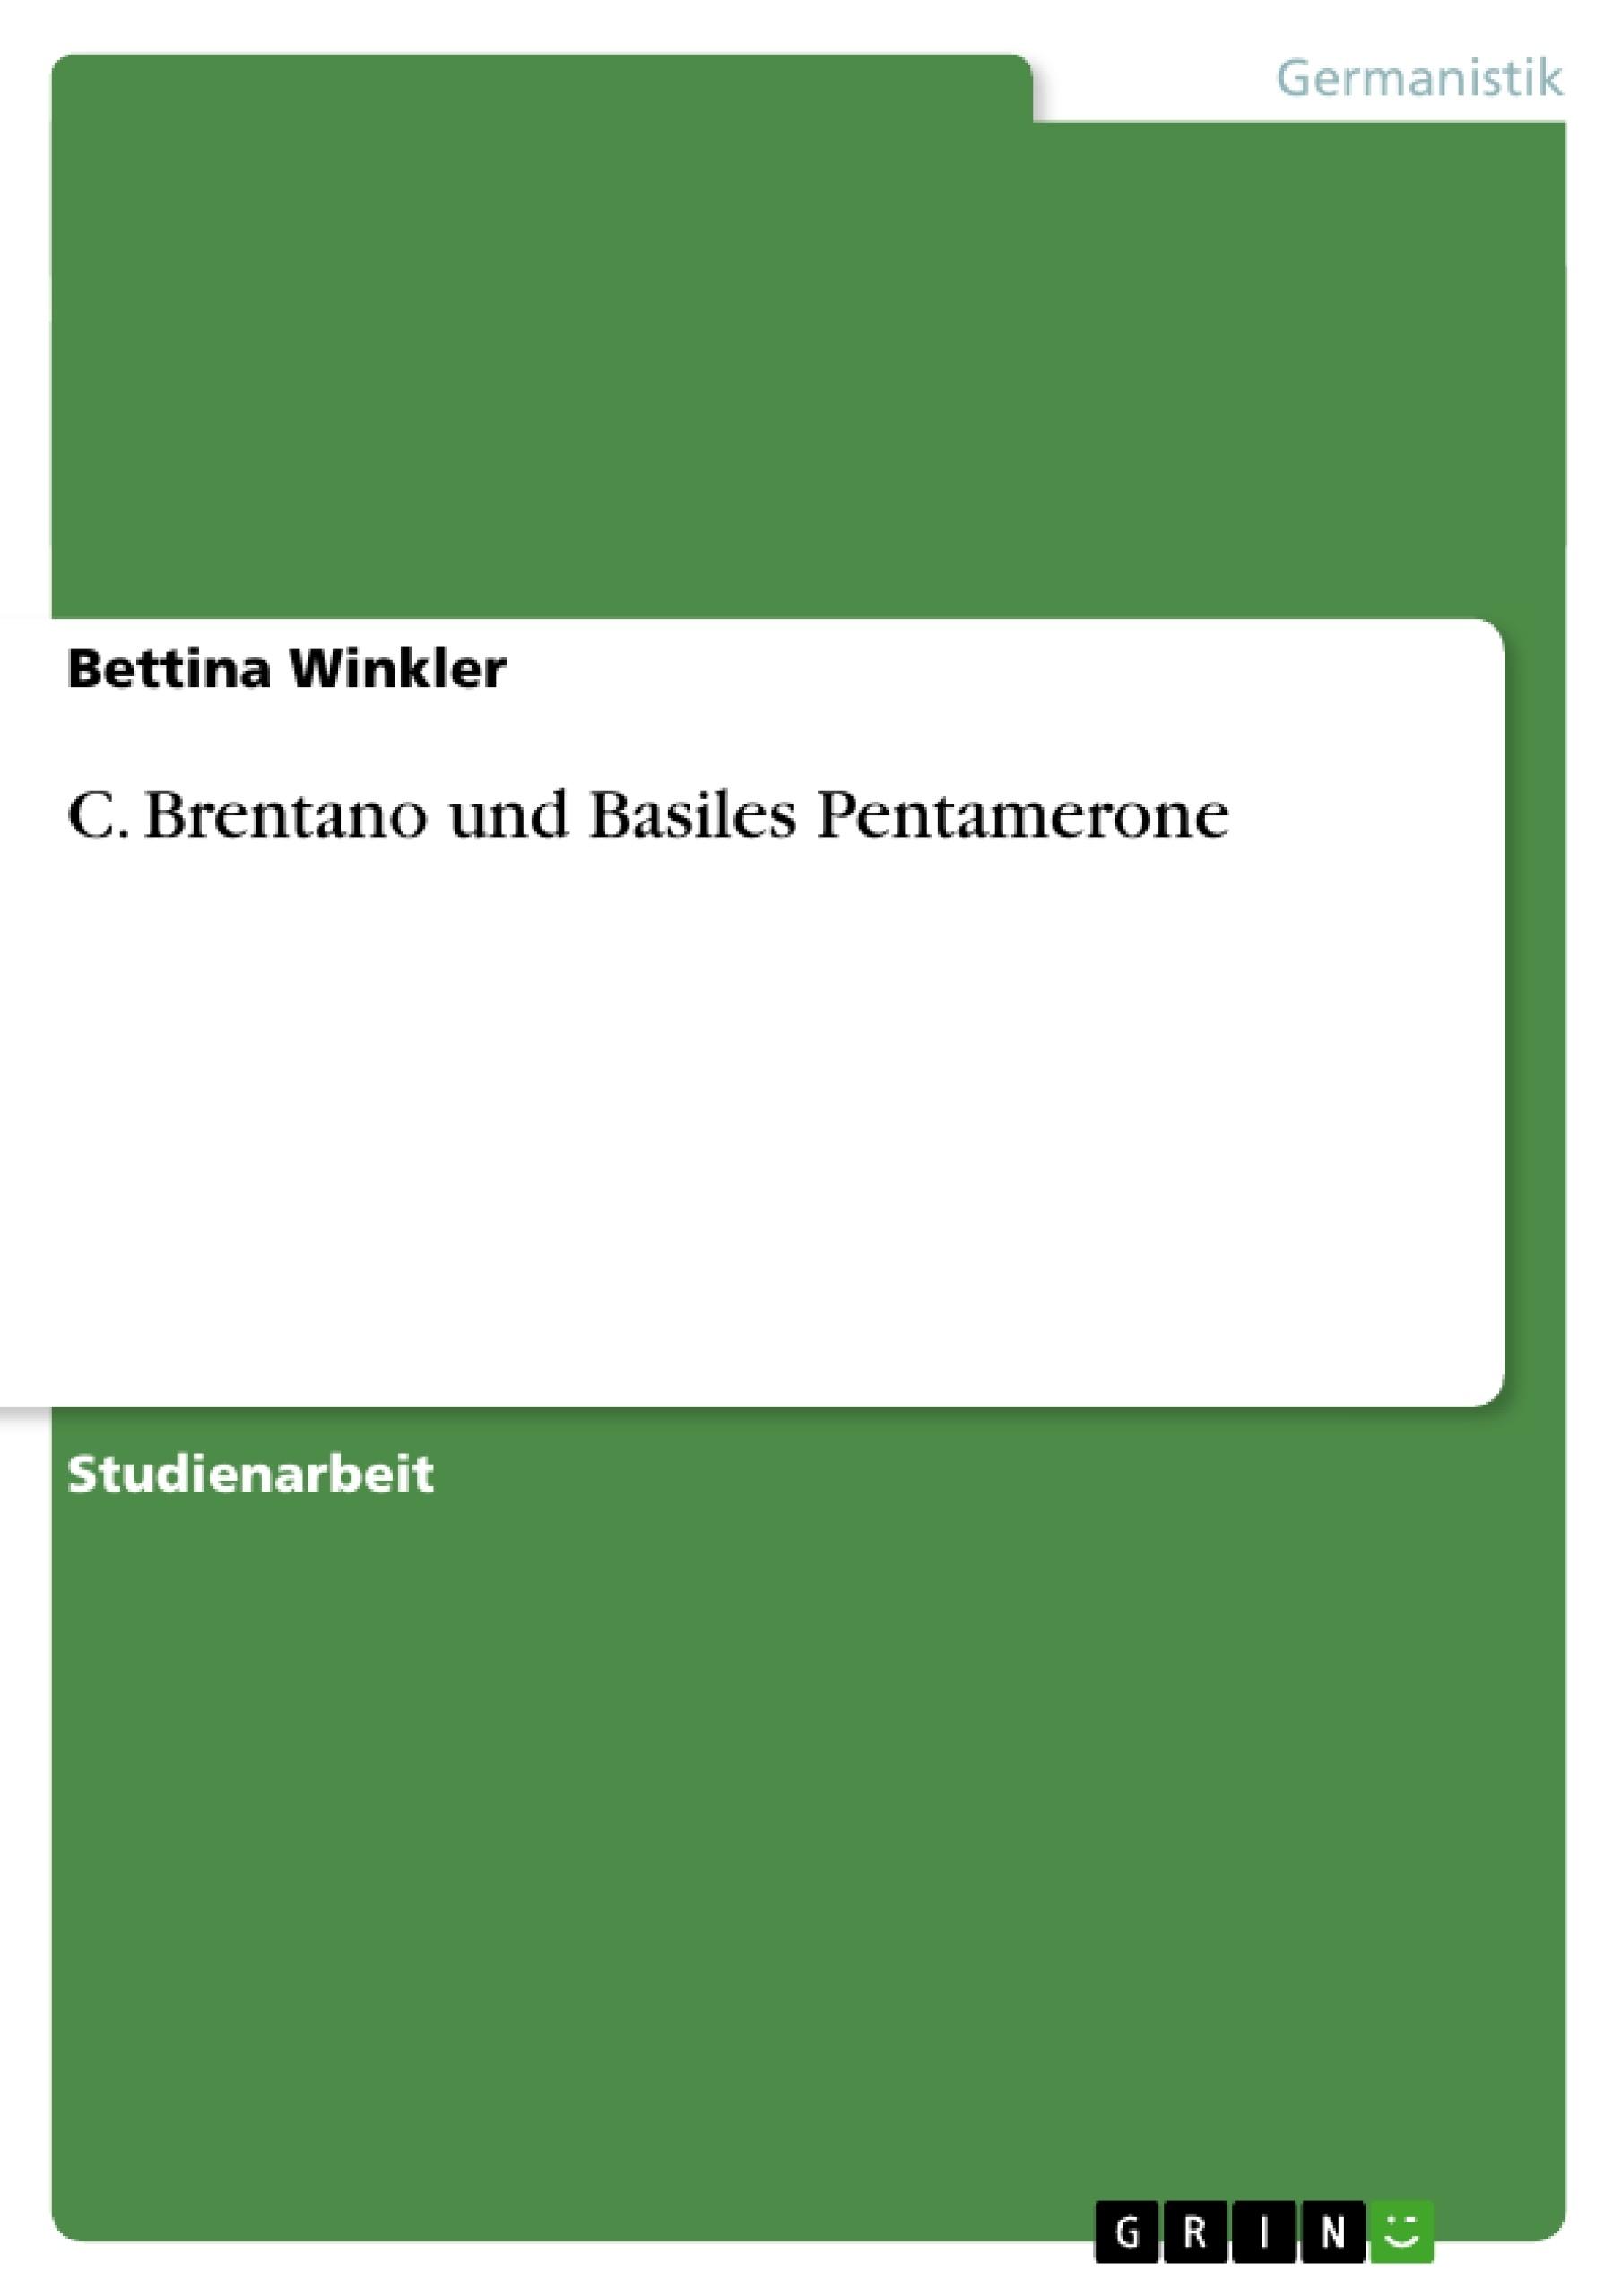 Titel: C. Brentano und Basiles Pentamerone